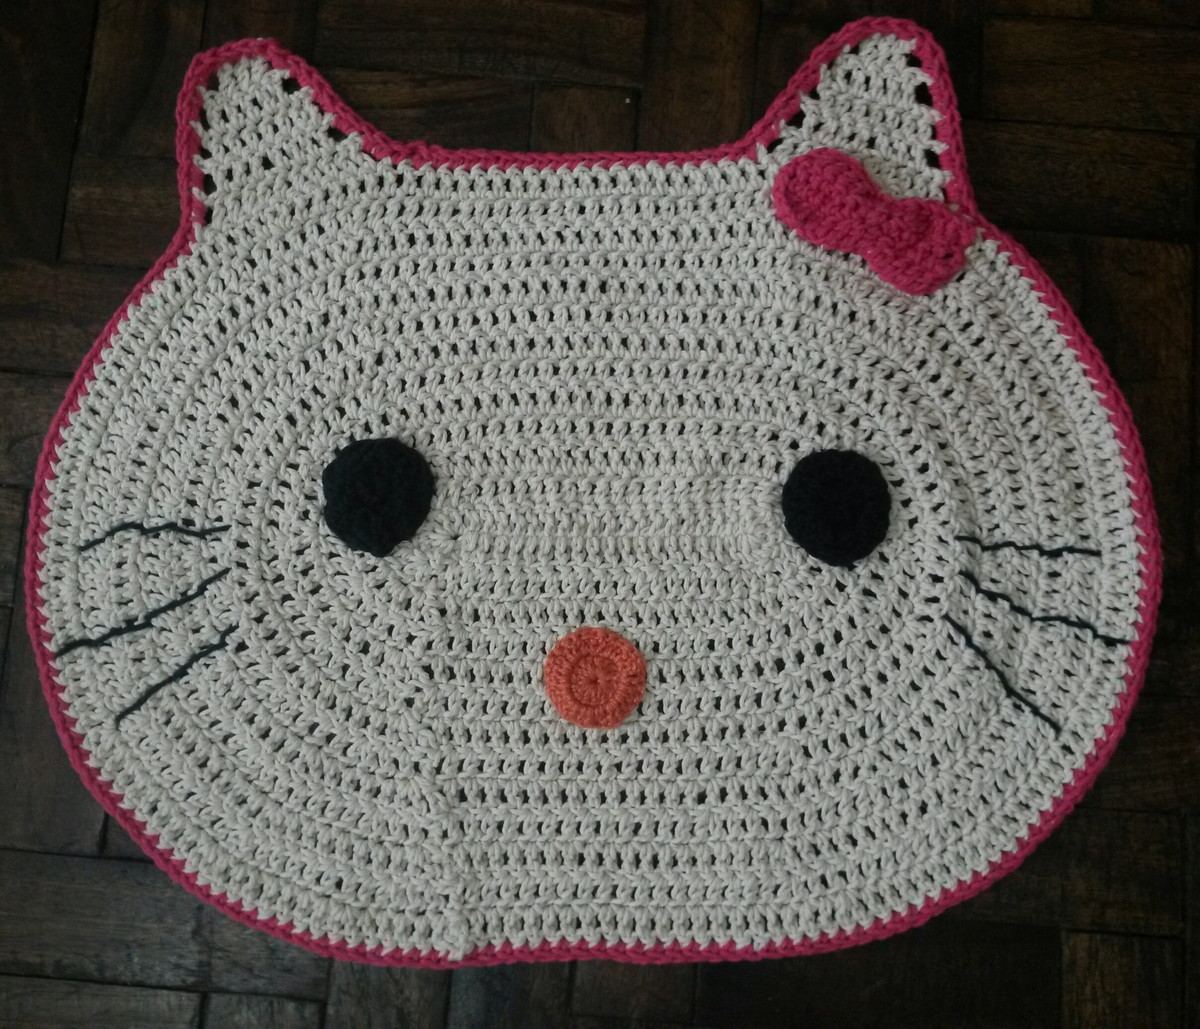 tapete hello kitty no elo7 anak artes krauklis 4acbdd. Black Bedroom Furniture Sets. Home Design Ideas